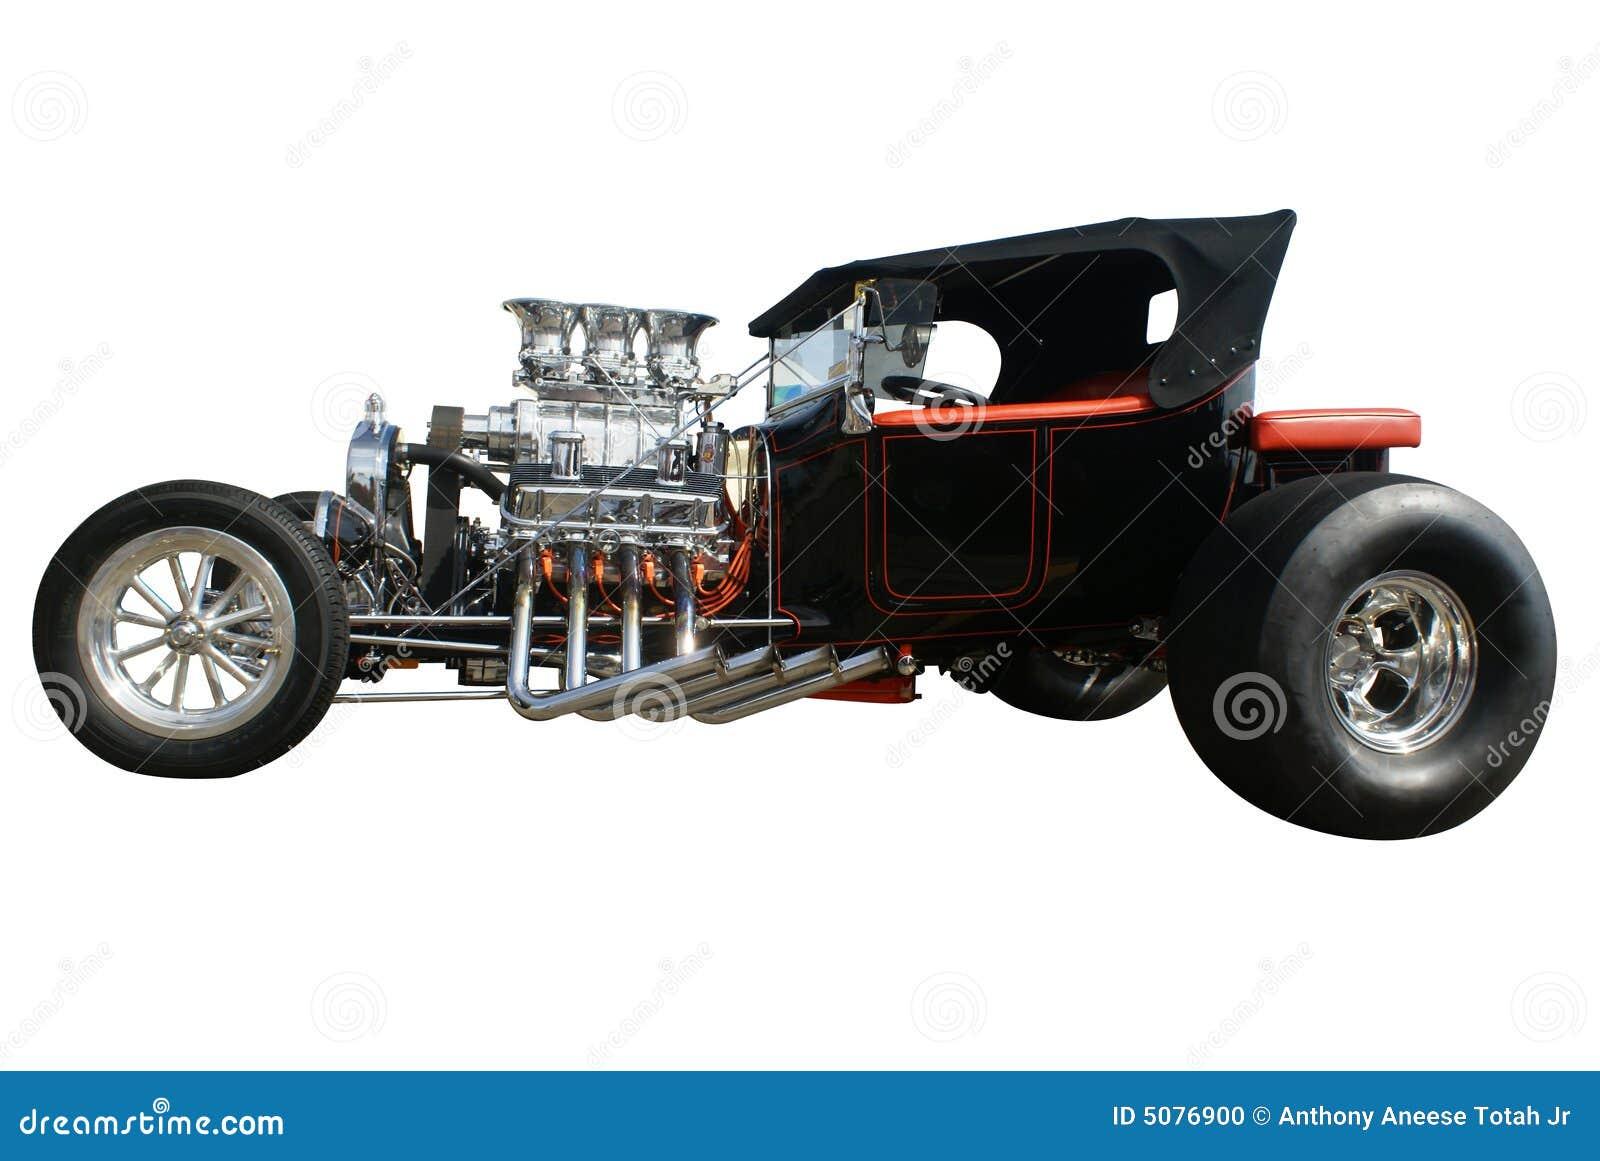 Souped Up Hotrod Car Stock Photo Image 5076900